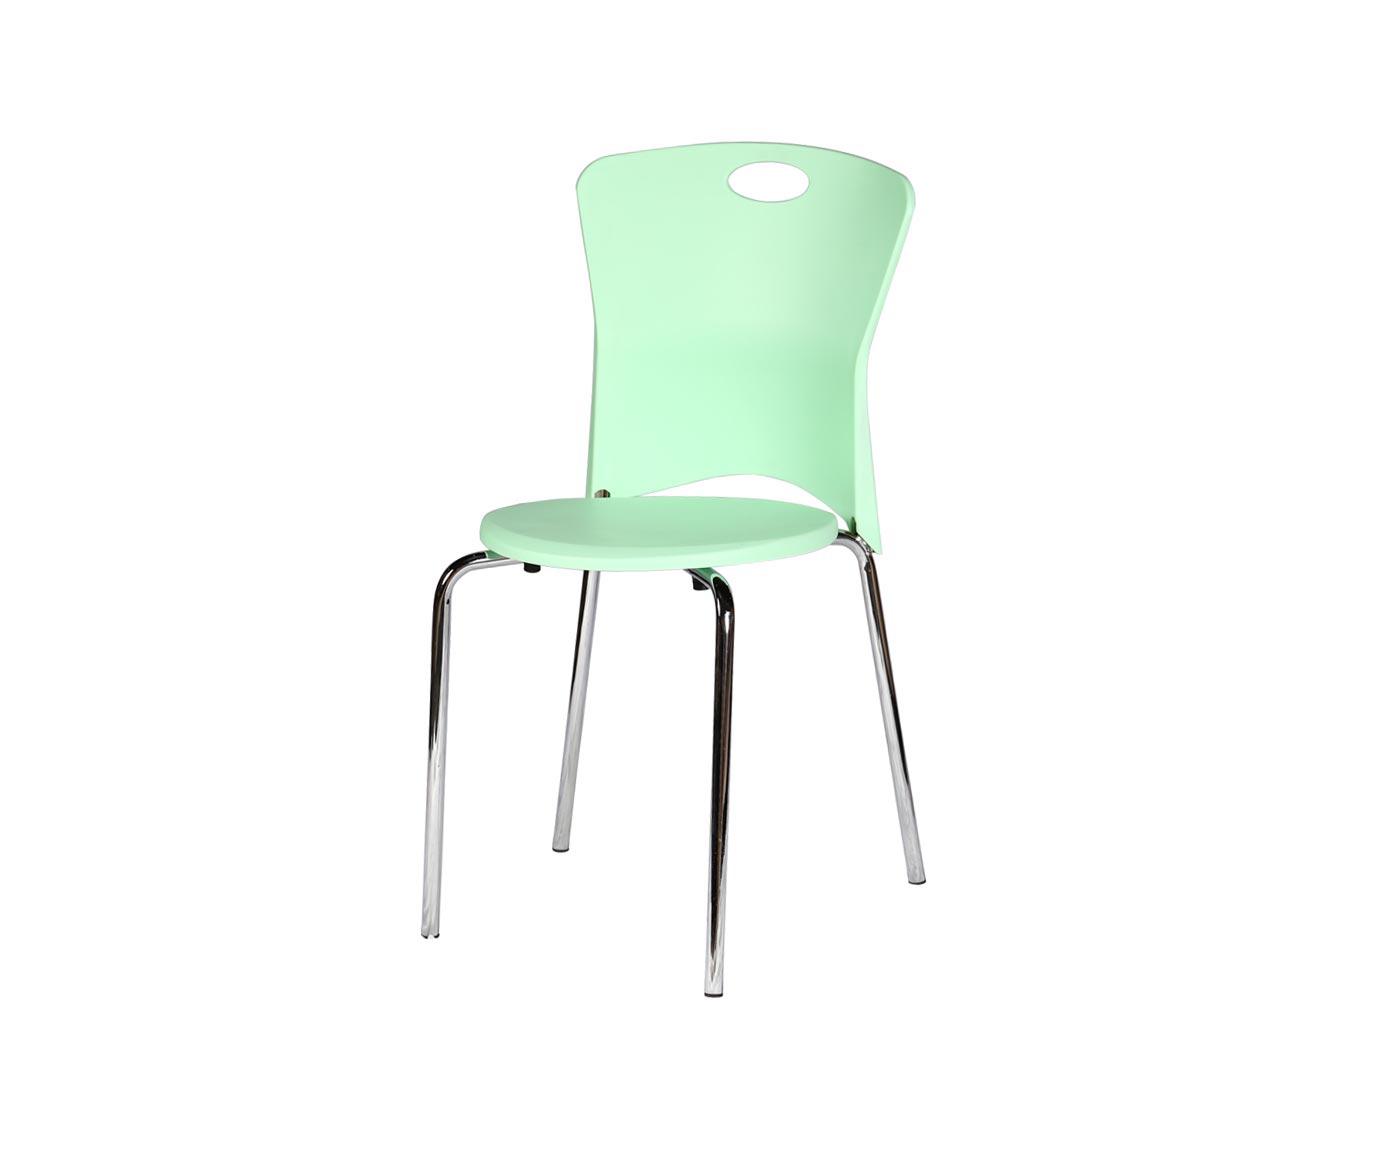 СтулОбеденные стулья<br><br><br>Material: Пластик<br>Width см: 55<br>Depth см: 55<br>Height см: 75